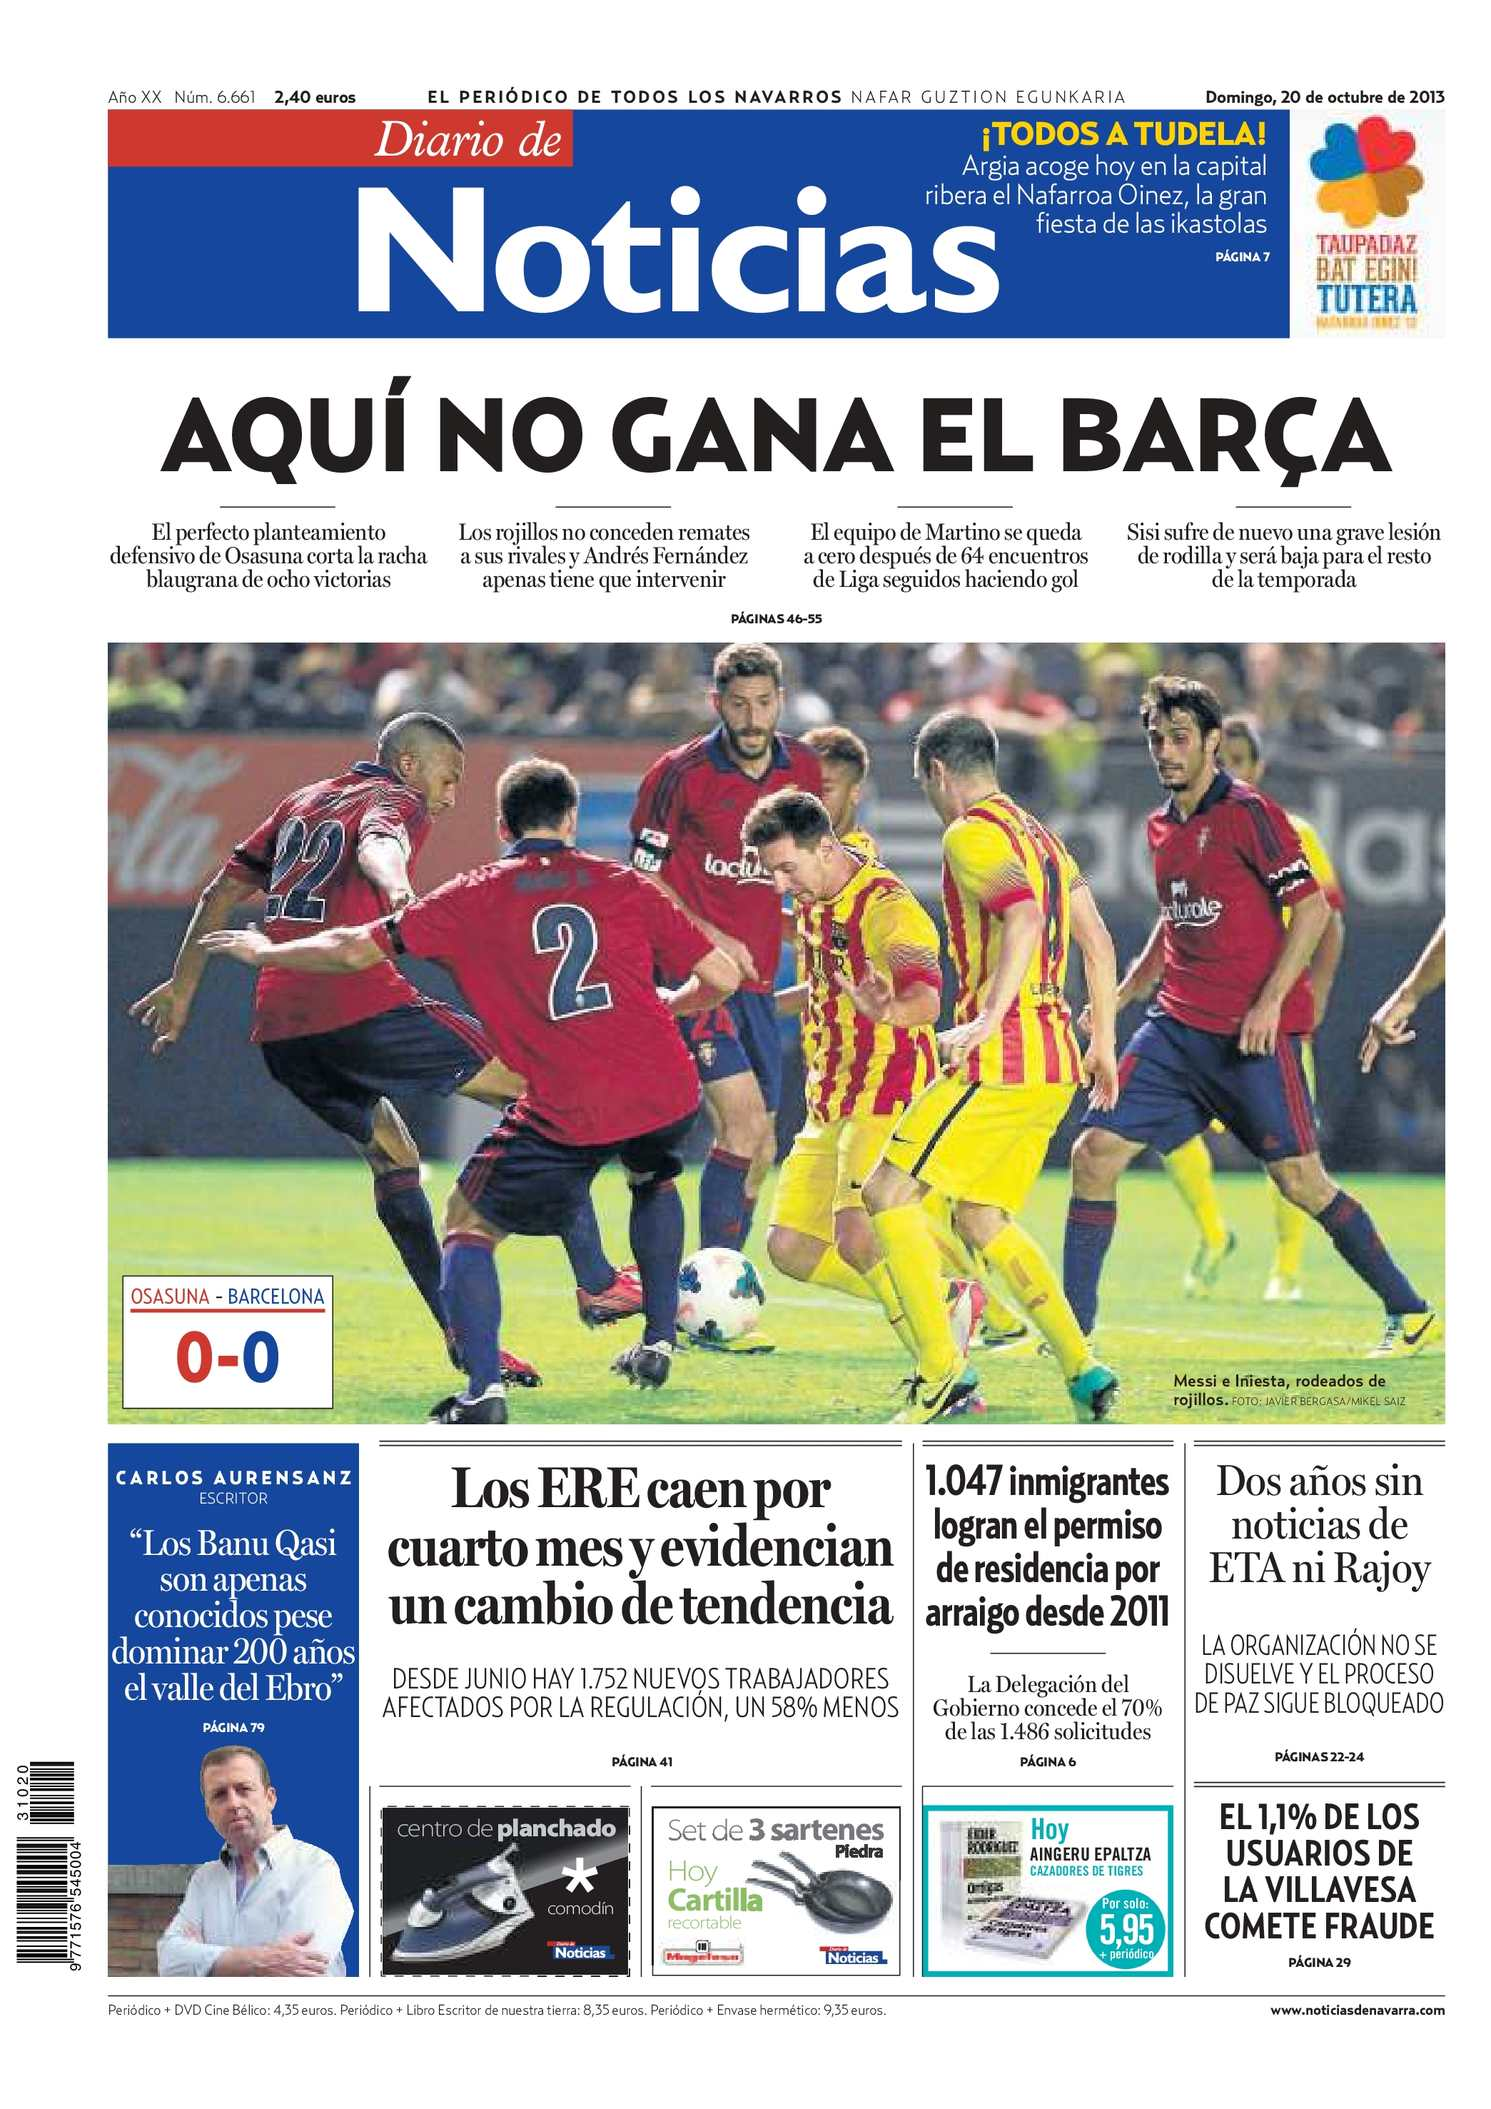 Calaméo - Diario de Noticias 20131020 5480efb17fc90